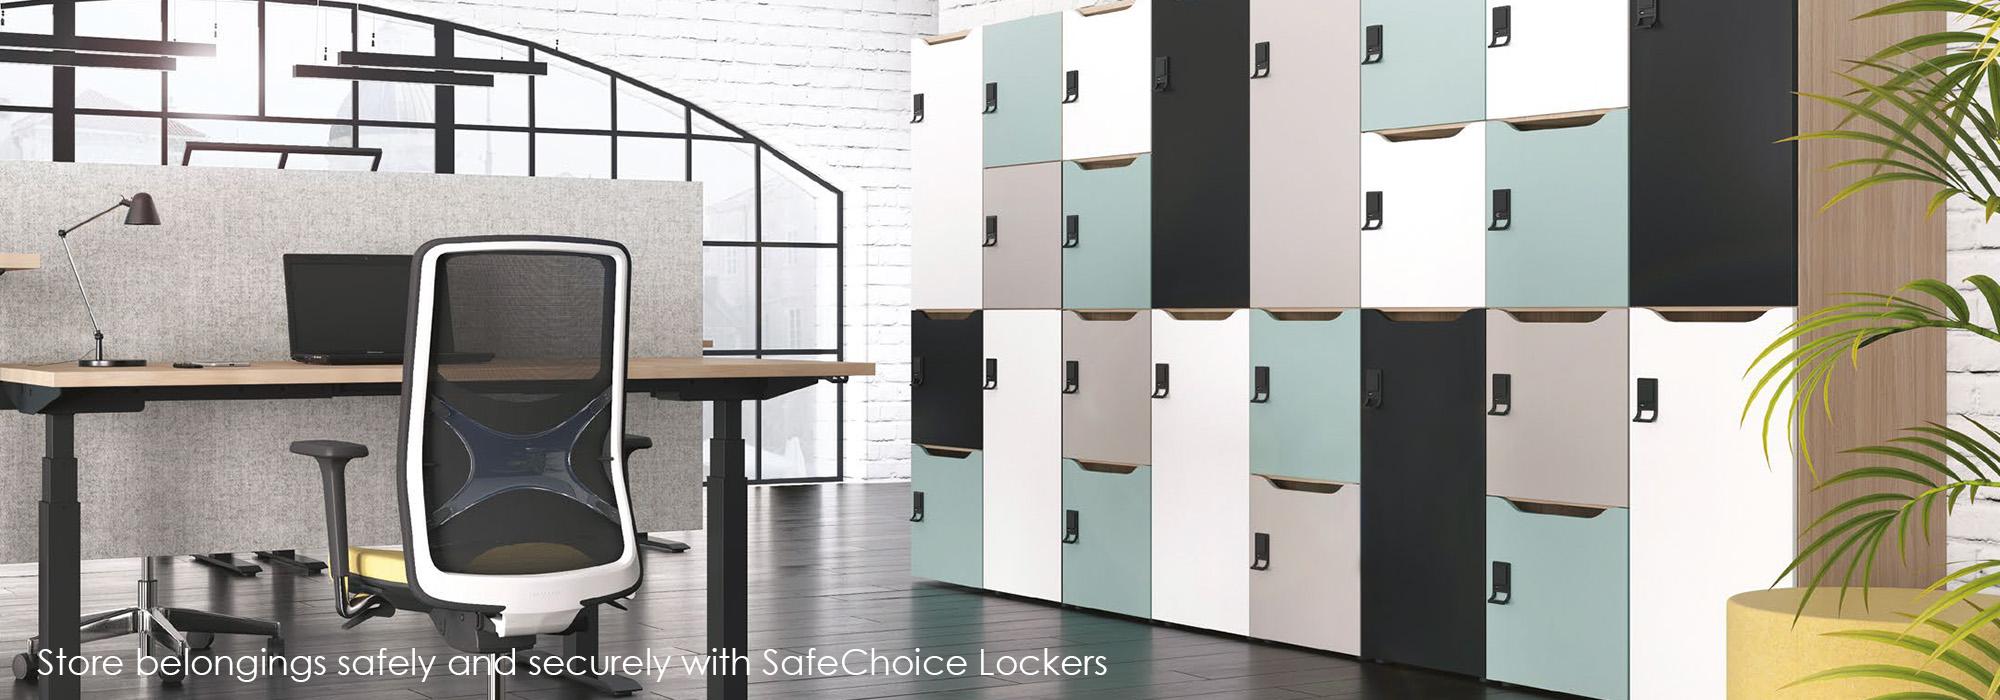 SafeChoice Lockers